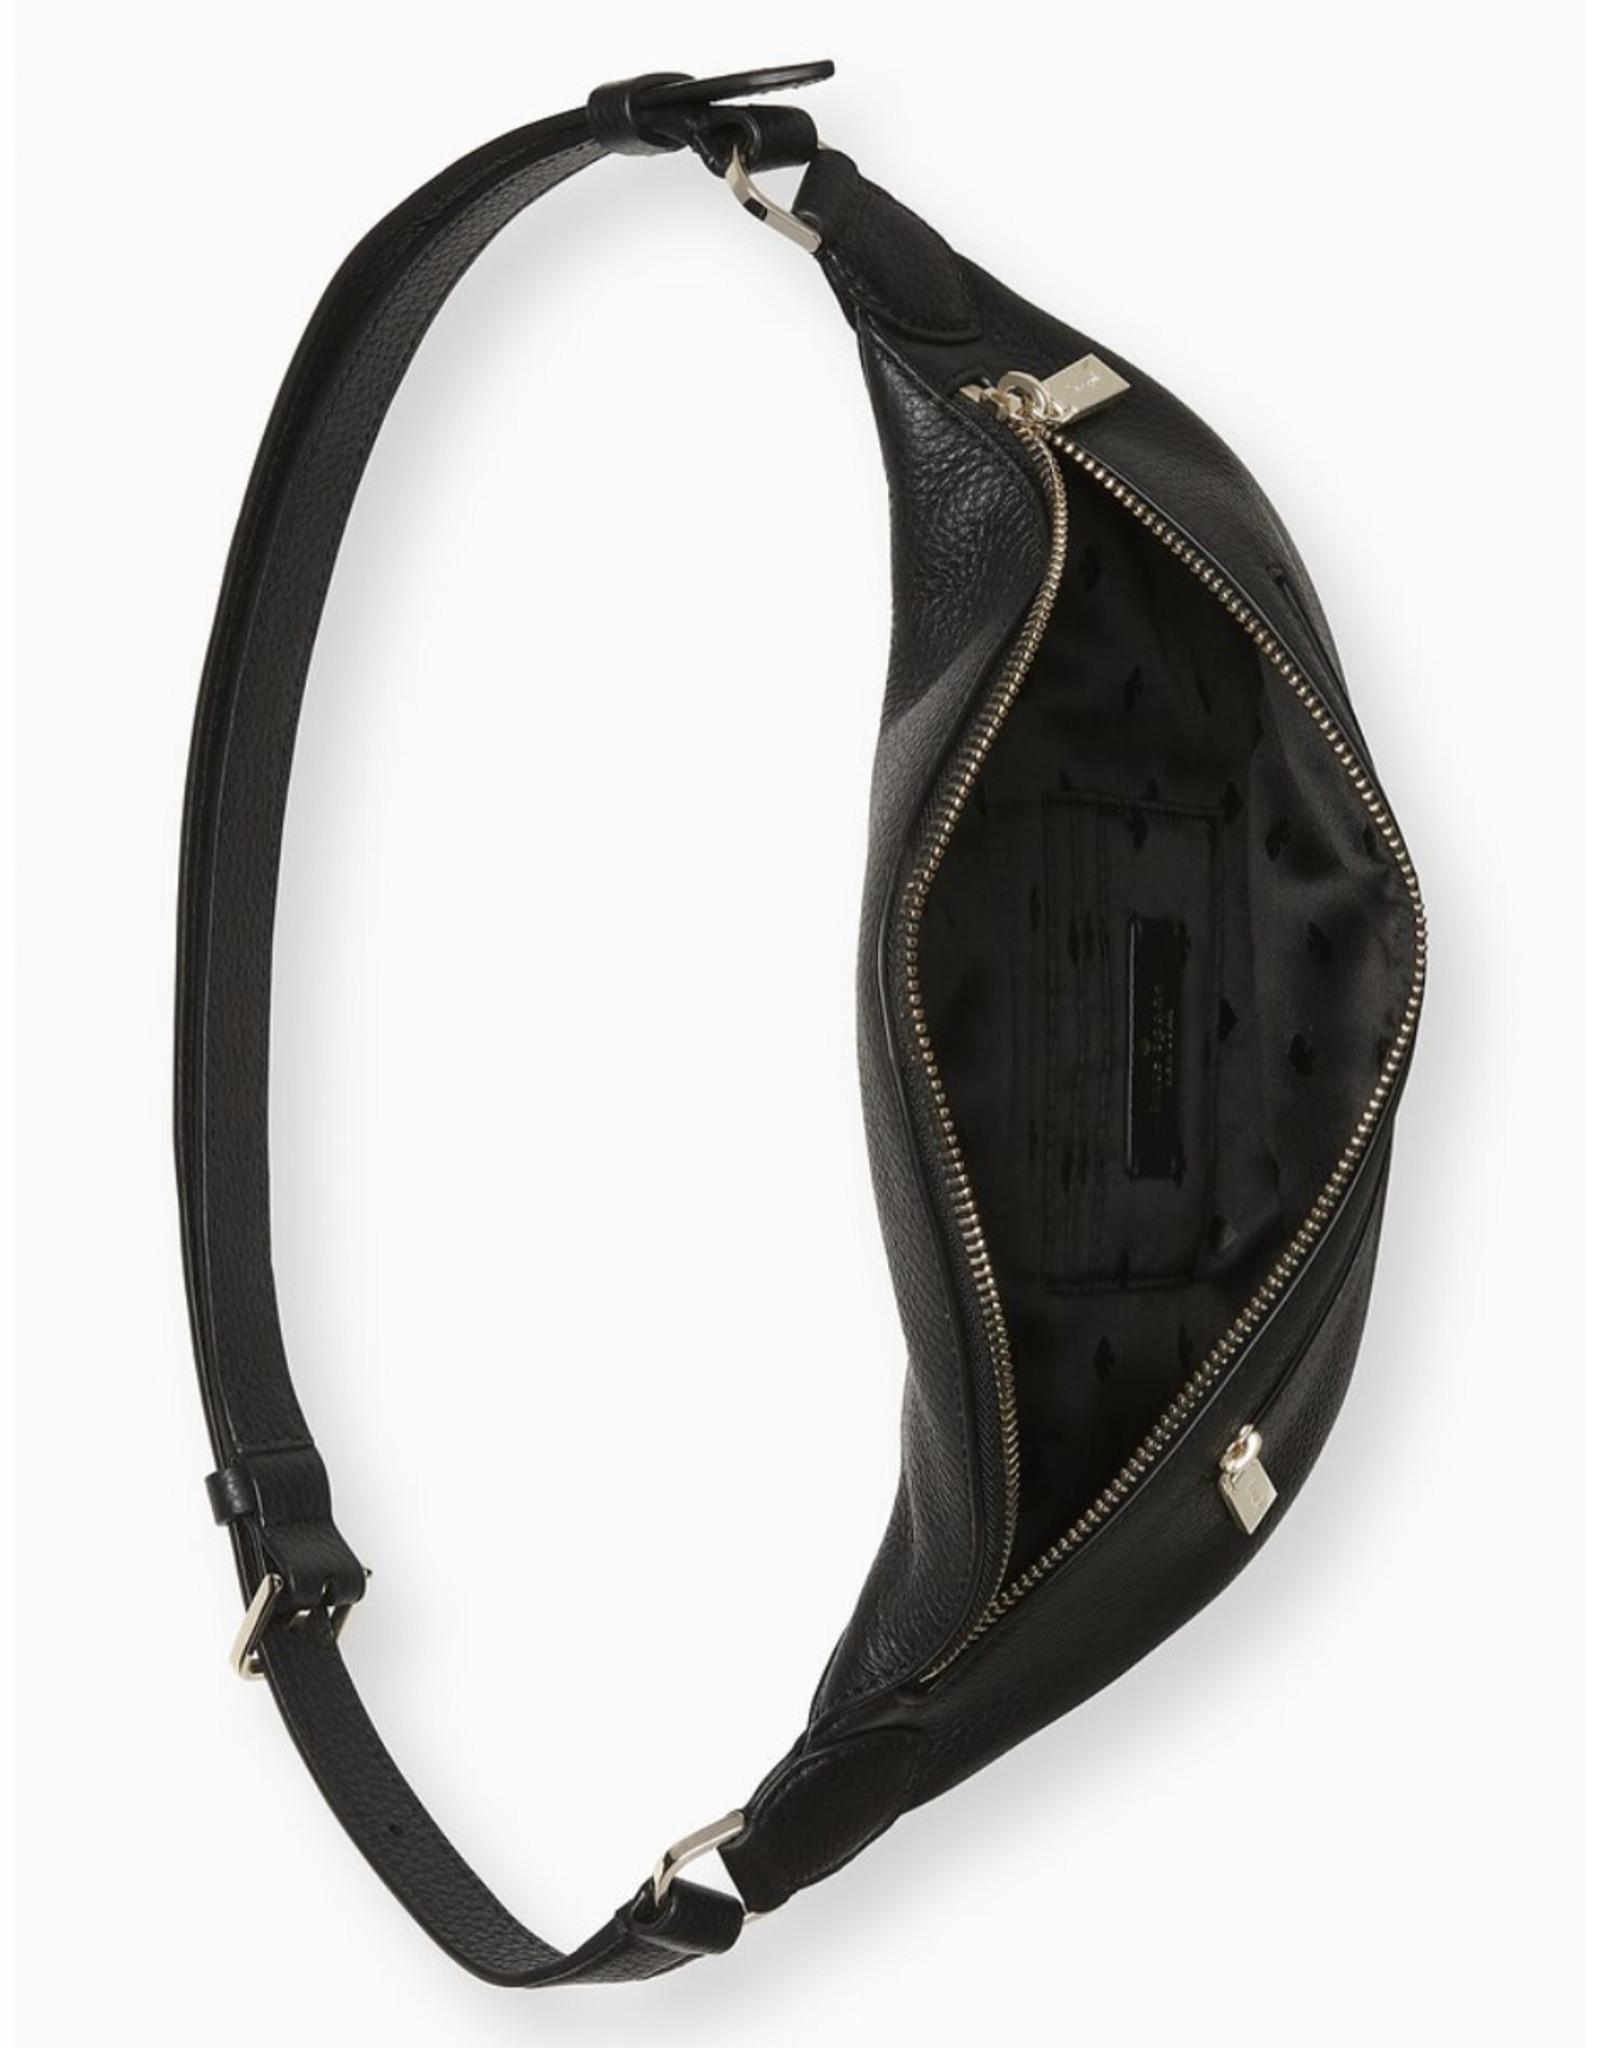 Kate Spade Kate Spade Leila Leather Pebbled Belt Bag